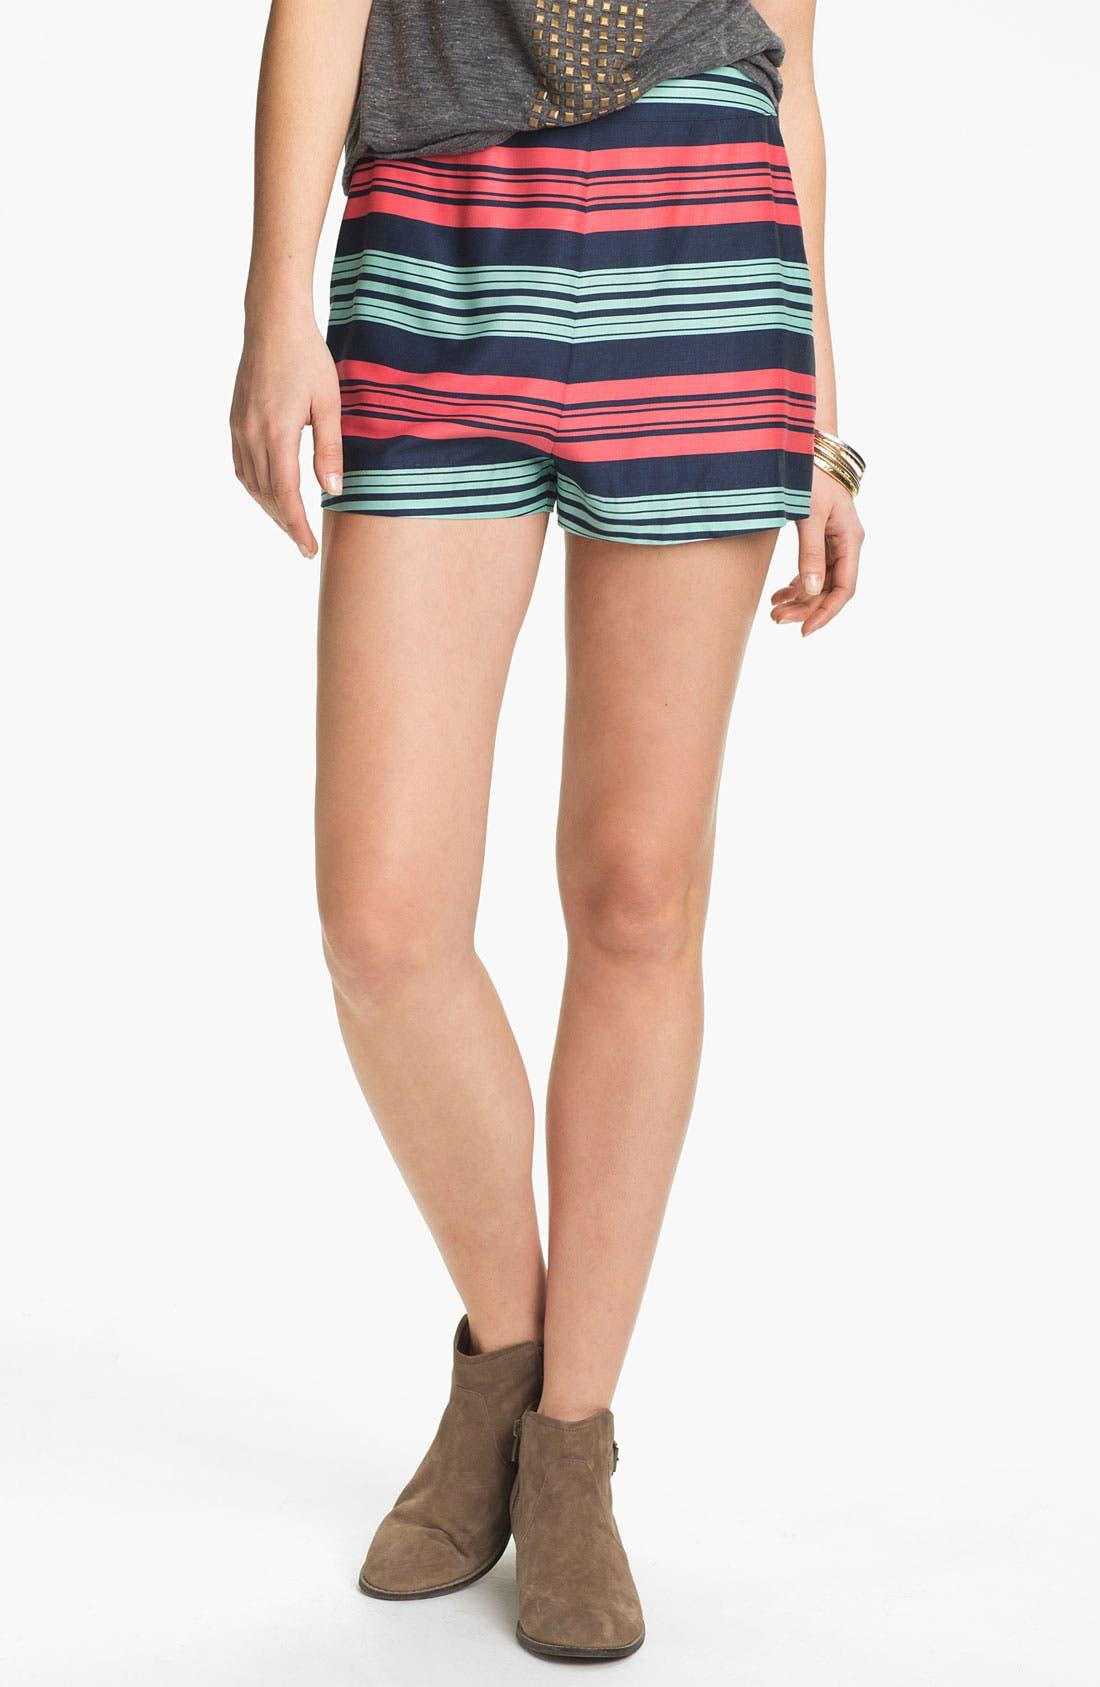 Alternate Image 1 Selected - BP. High Waist Stripe Shorts (Juniors)